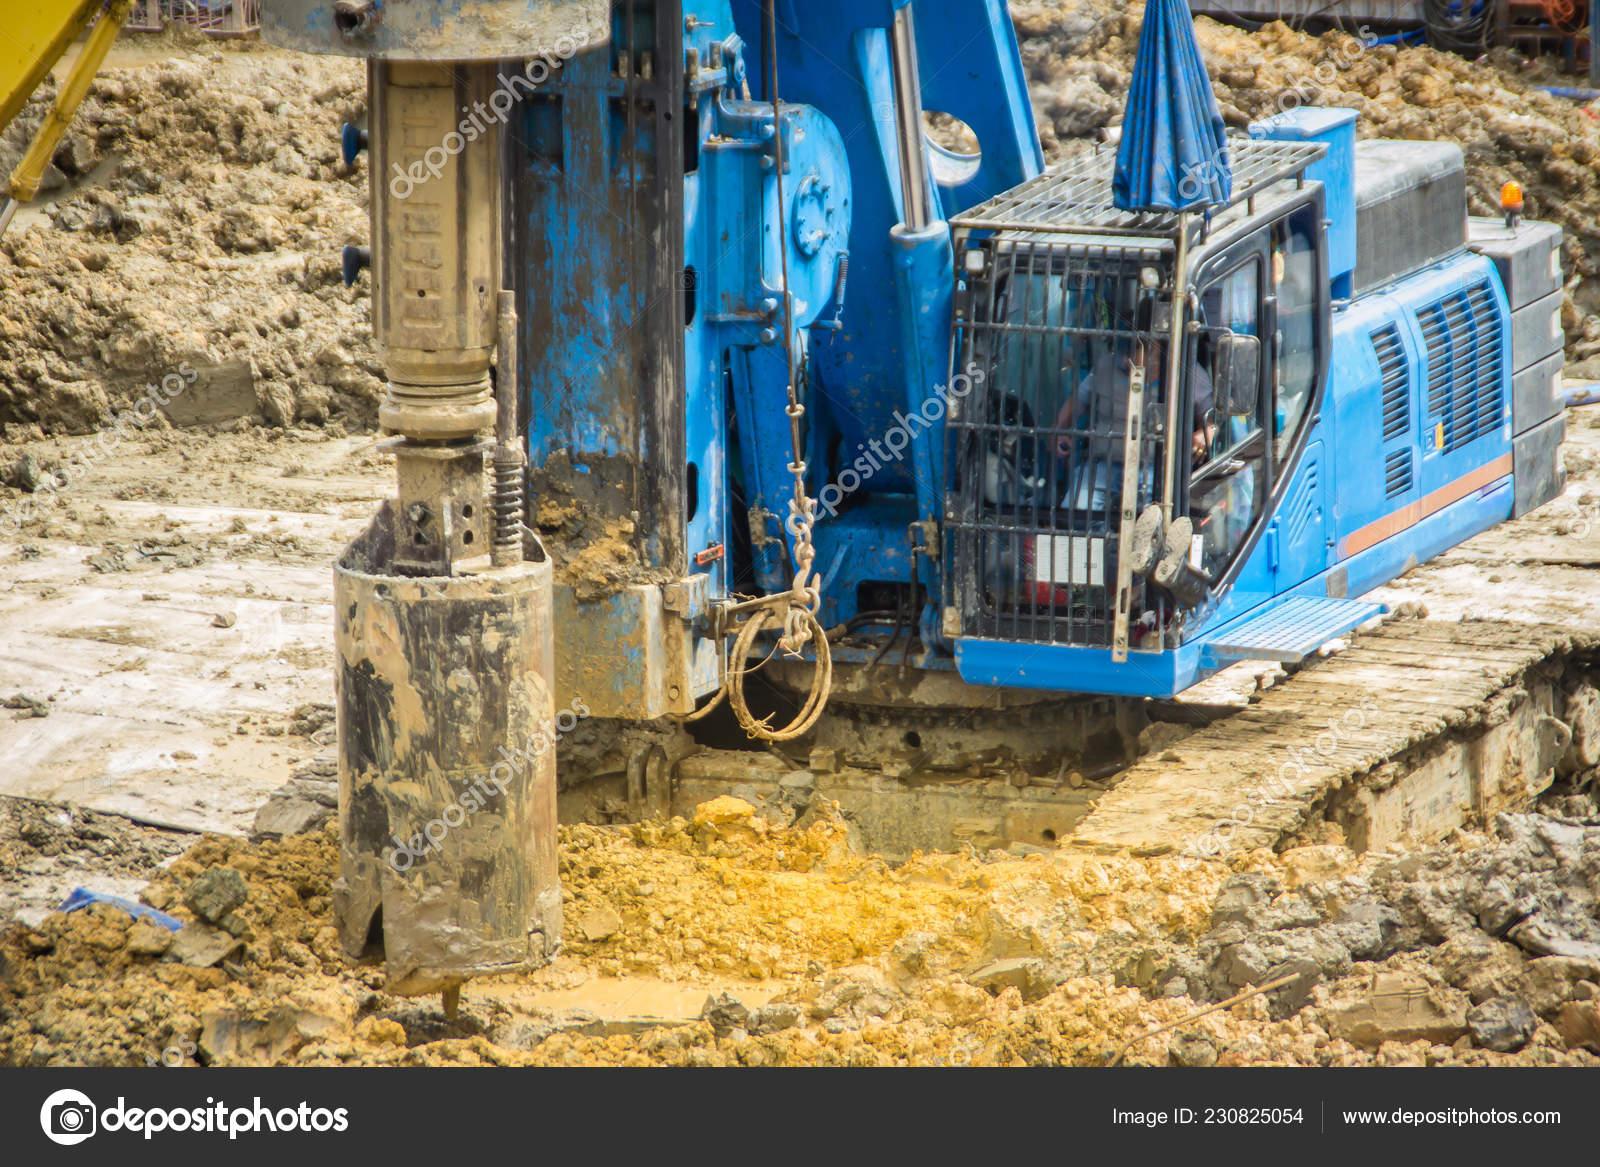 Hydraulic Drilling Machine Boring Holes Construction Site